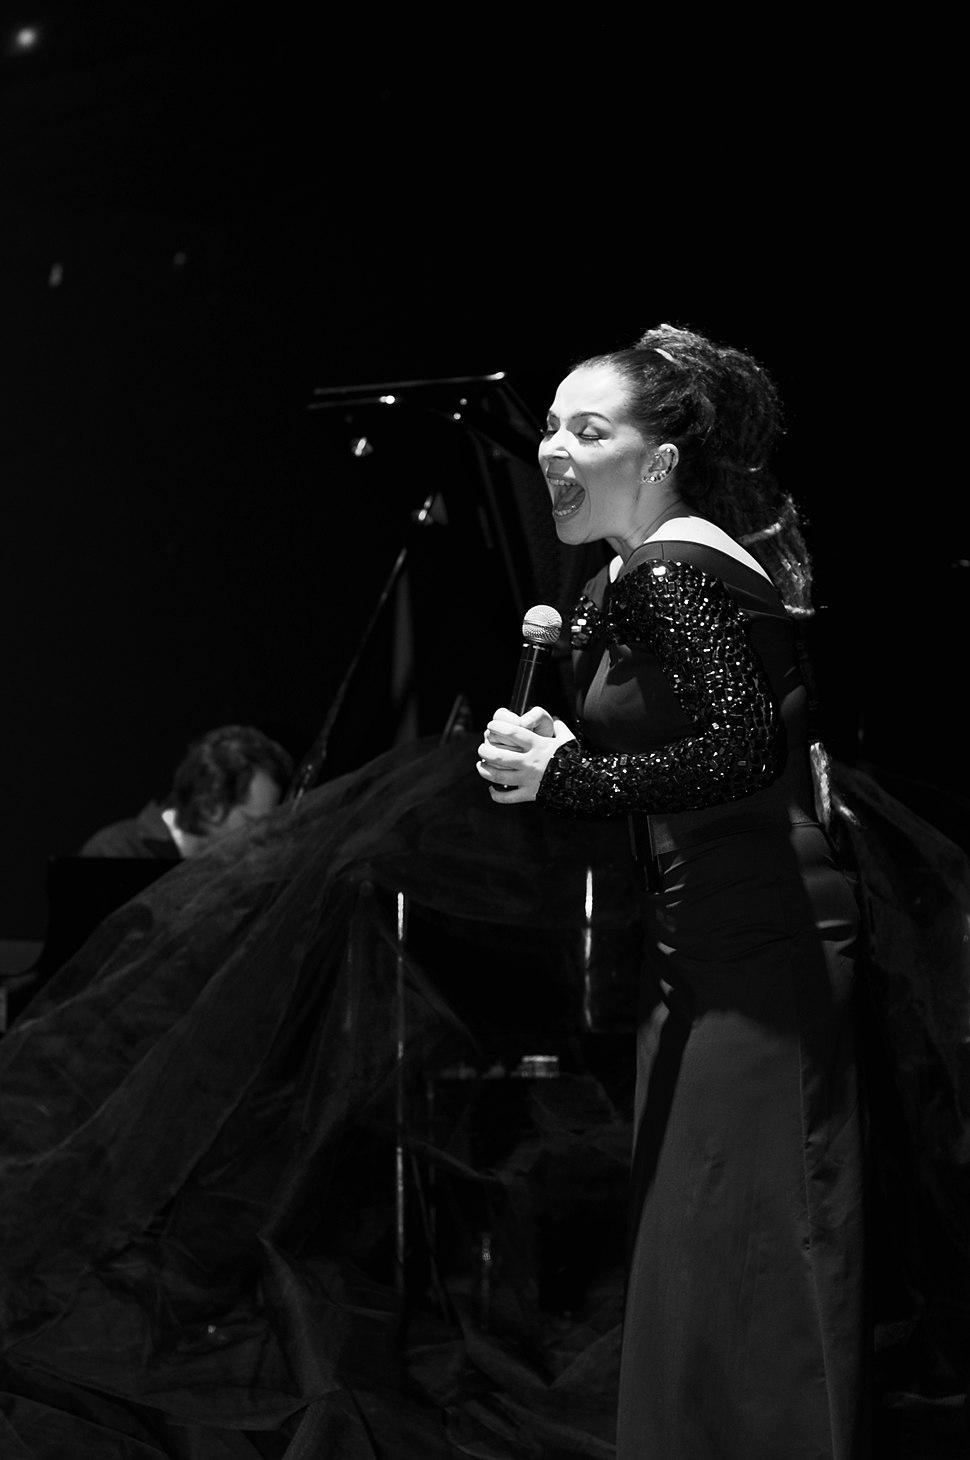 Rona Nishliu